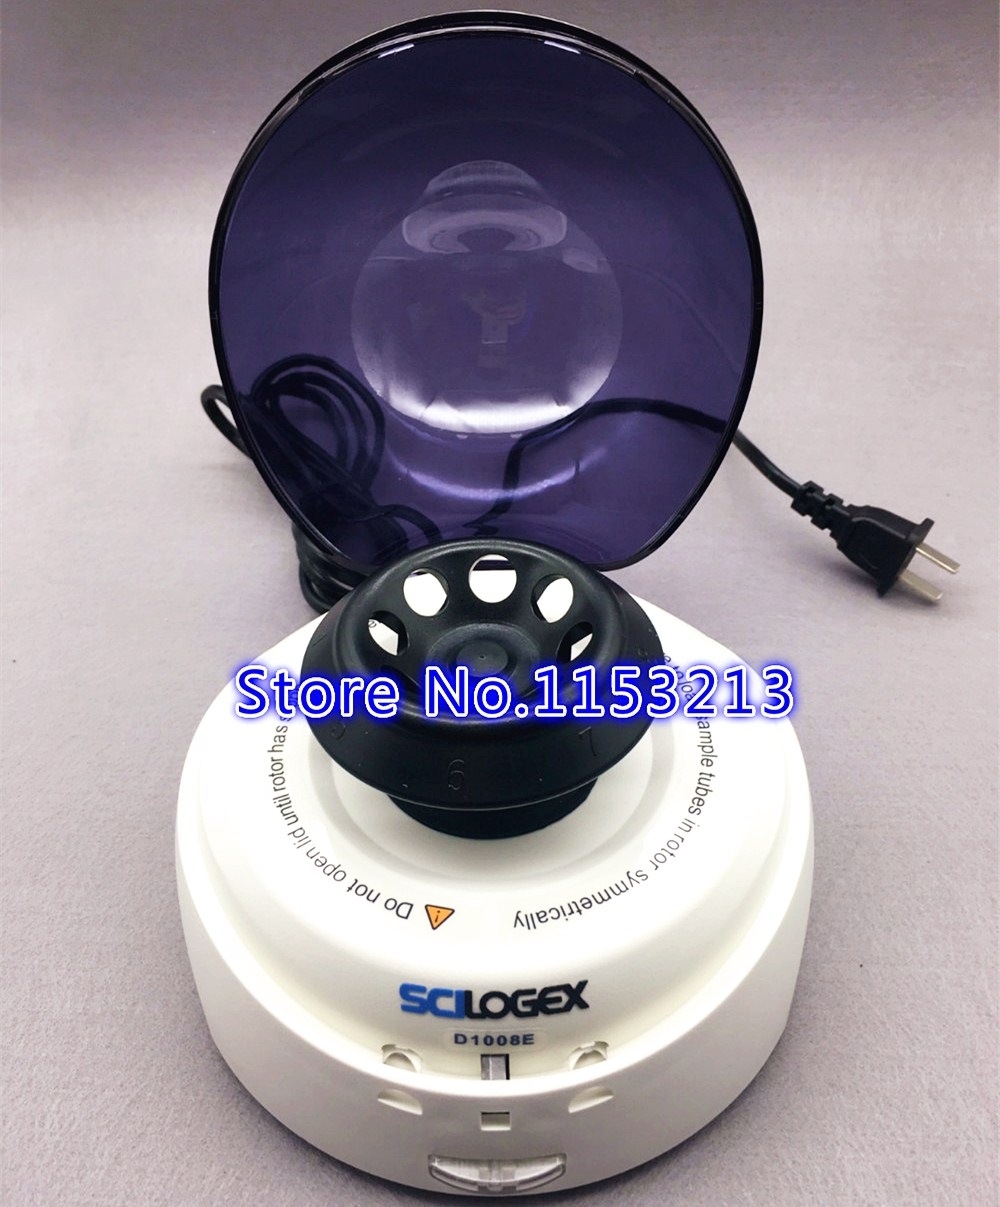 SCILOGEX D1008E Mini-Centrifuges 5000rpm Mini palm Centrifuge 0.5ml, 1.5ml, 2ml Laboratory CentrifugeSCILOGEX D1008E Mini-Centrifuges 5000rpm Mini palm Centrifuge 0.5ml, 1.5ml, 2ml Laboratory Centrifuge